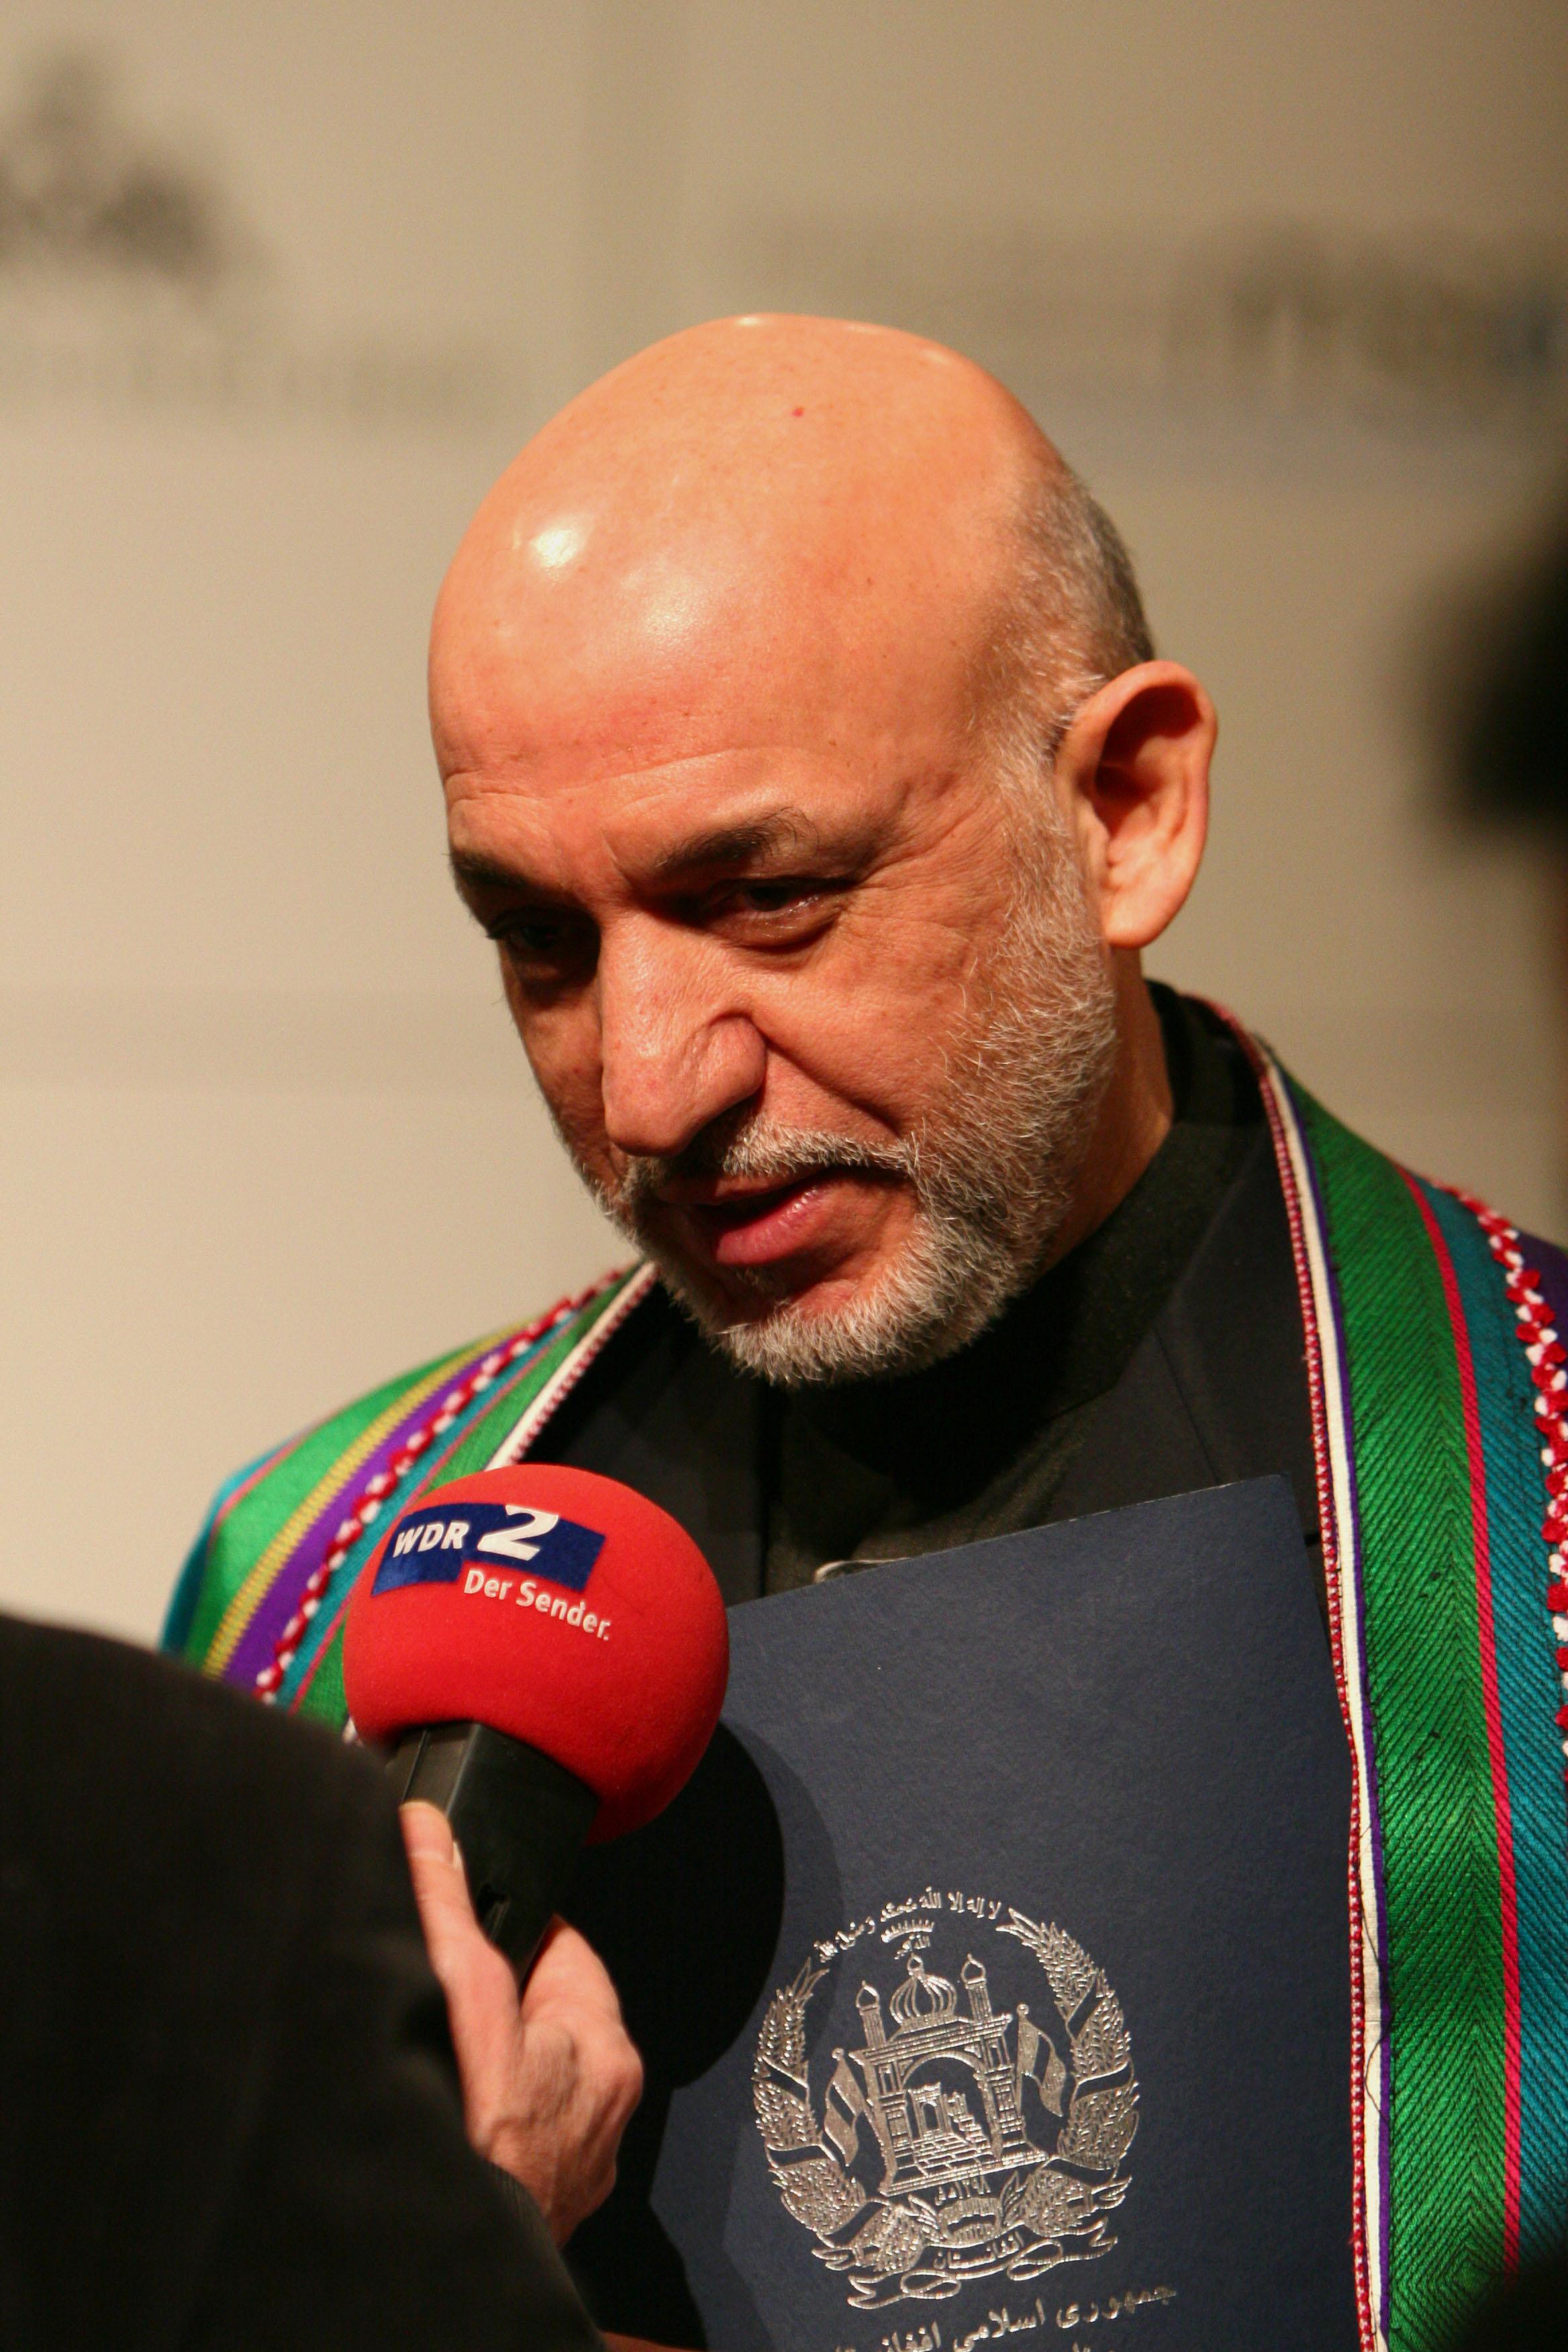 Afghanistan, Präsident  | Bild (Ausschnitt): © Harald Dettenborn - Wikimedia Commons